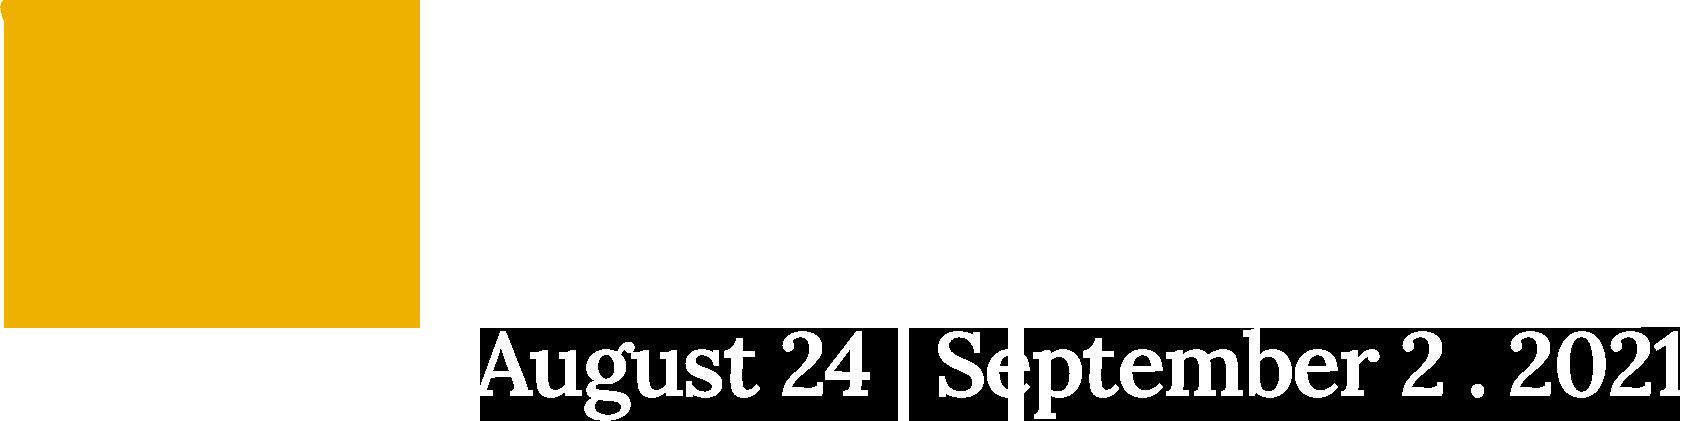 logo-in-movie-fest-eng